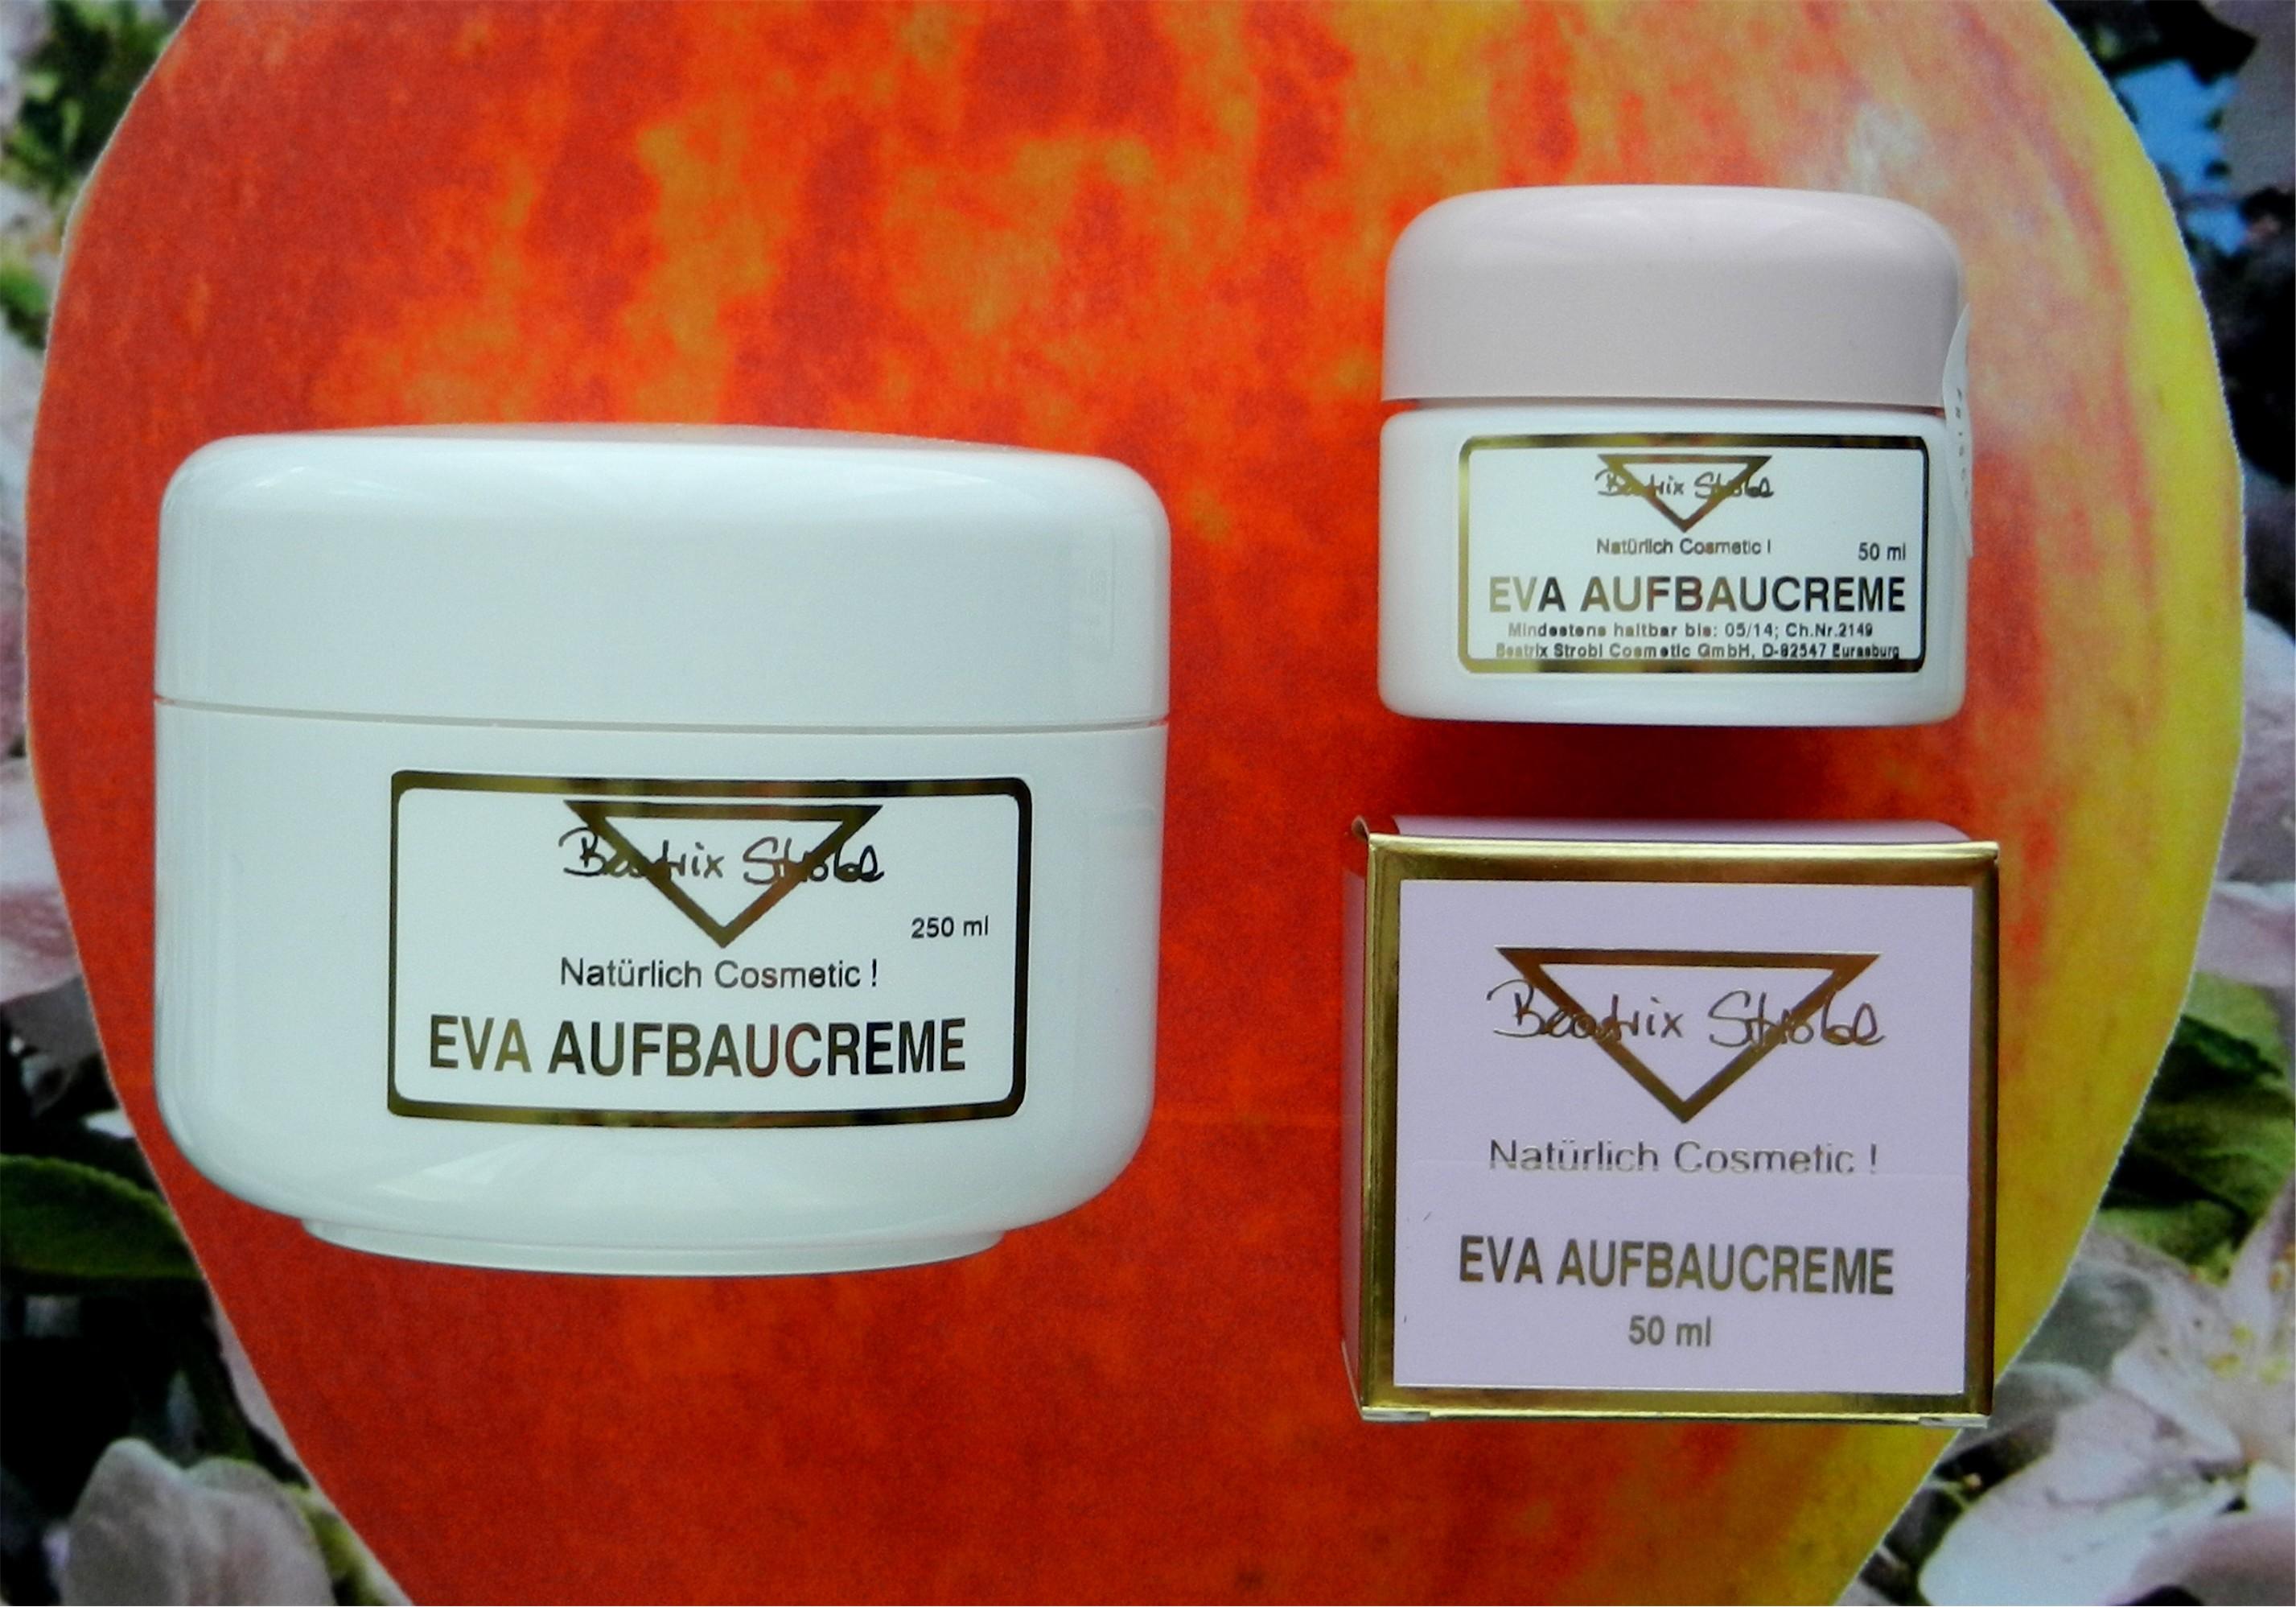 EVA AUFBAUCREME parfümfrei